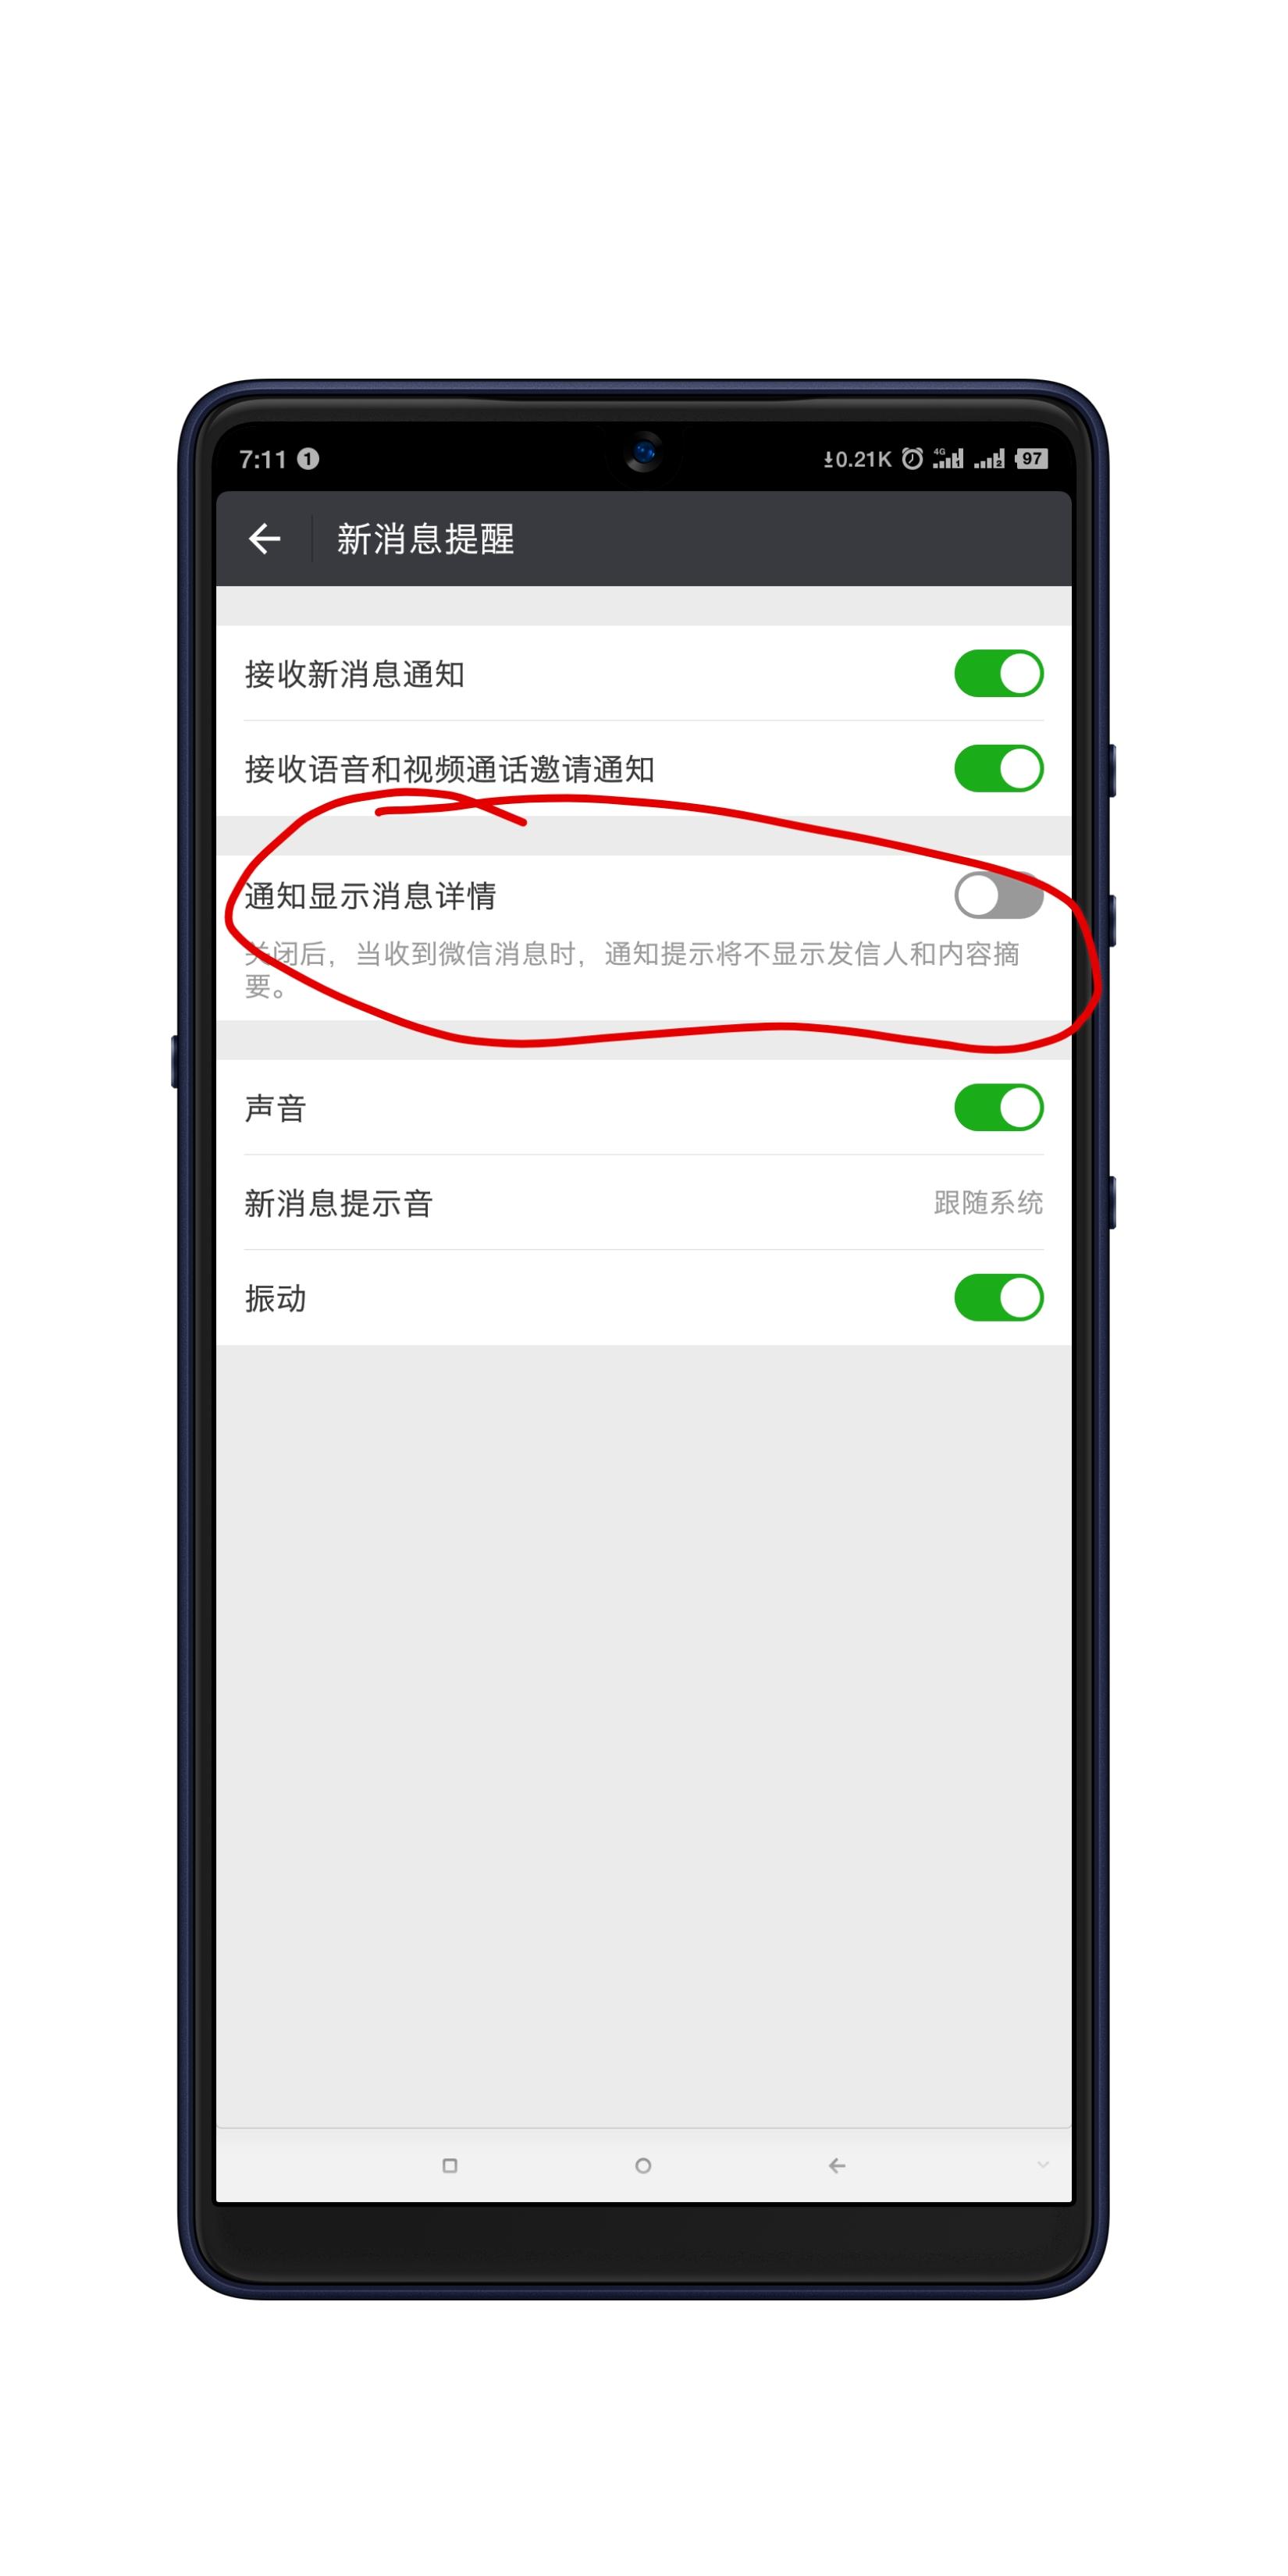 ??_Screenshot_2019-01-16-07-12-00-264_??.png